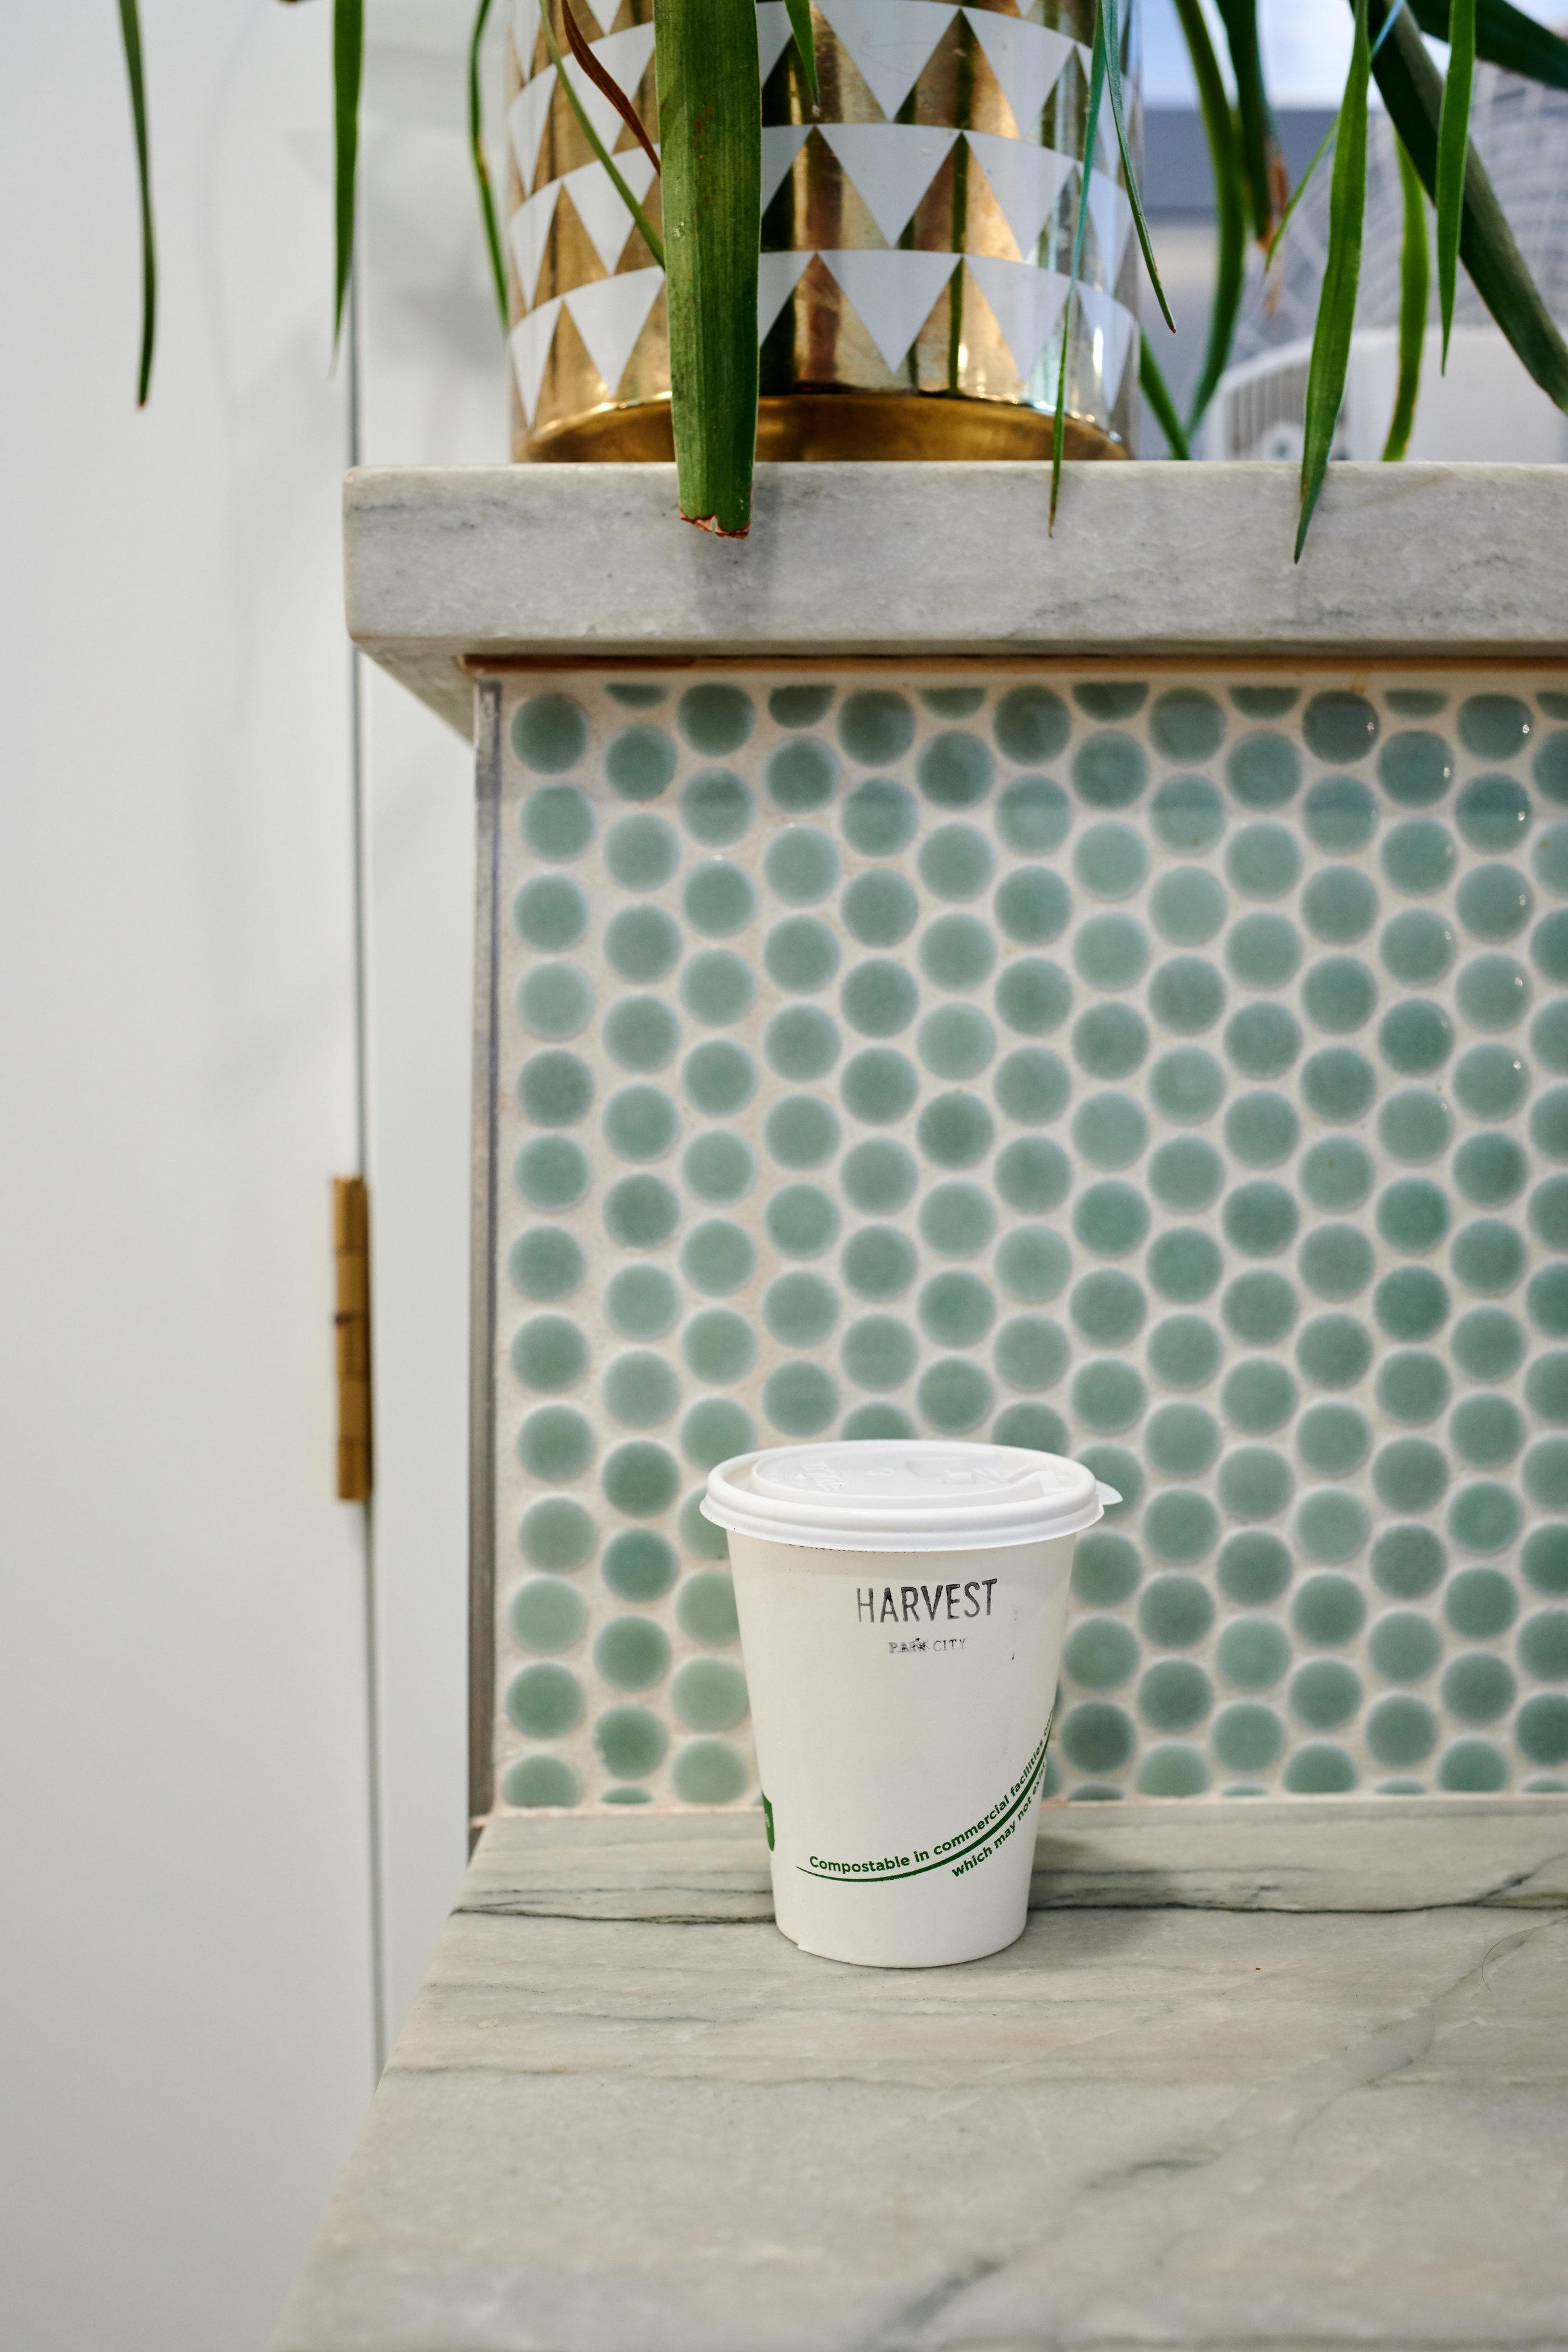 Drip Coffee at Harvest